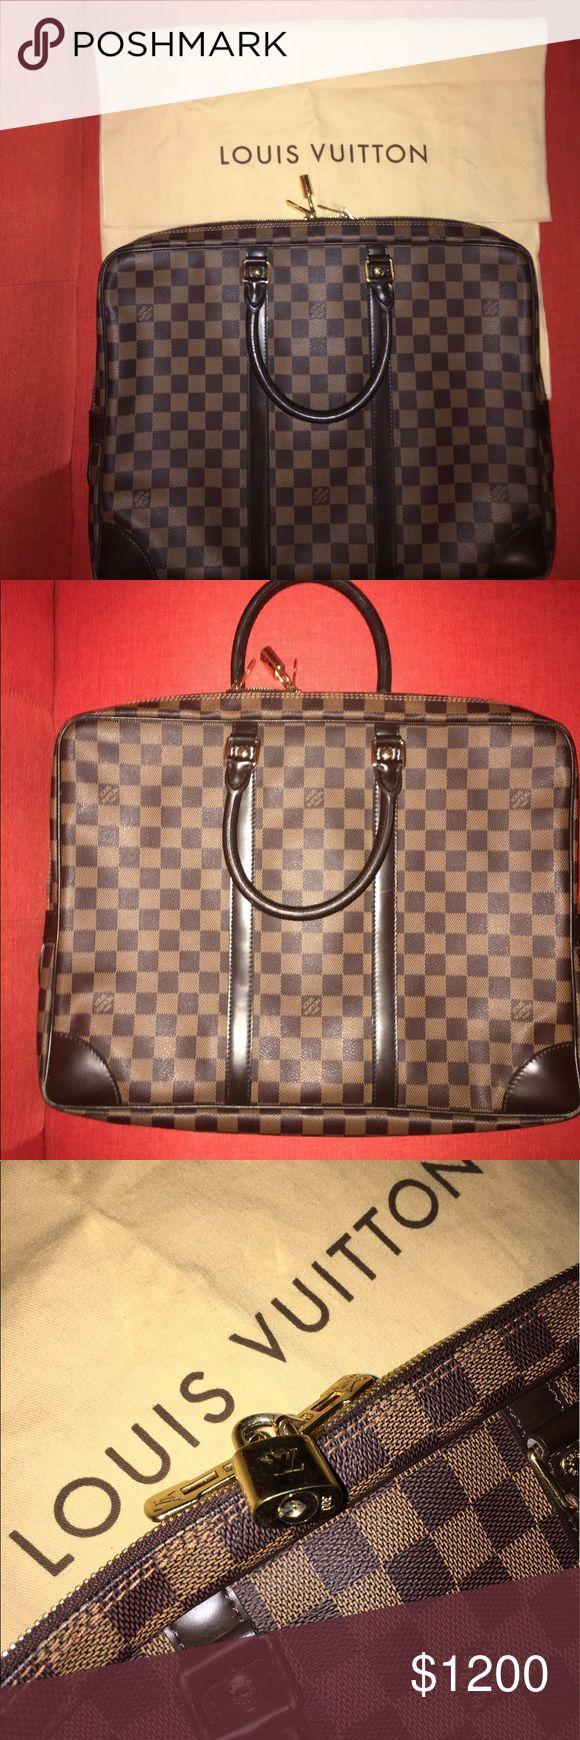 Louis Vuitton Briefcase Authentic Louis Vuitton Daniel Canvas Briefcase, good condition besides the scratch on the corner of the Briefcase Louis Vuitton Bags